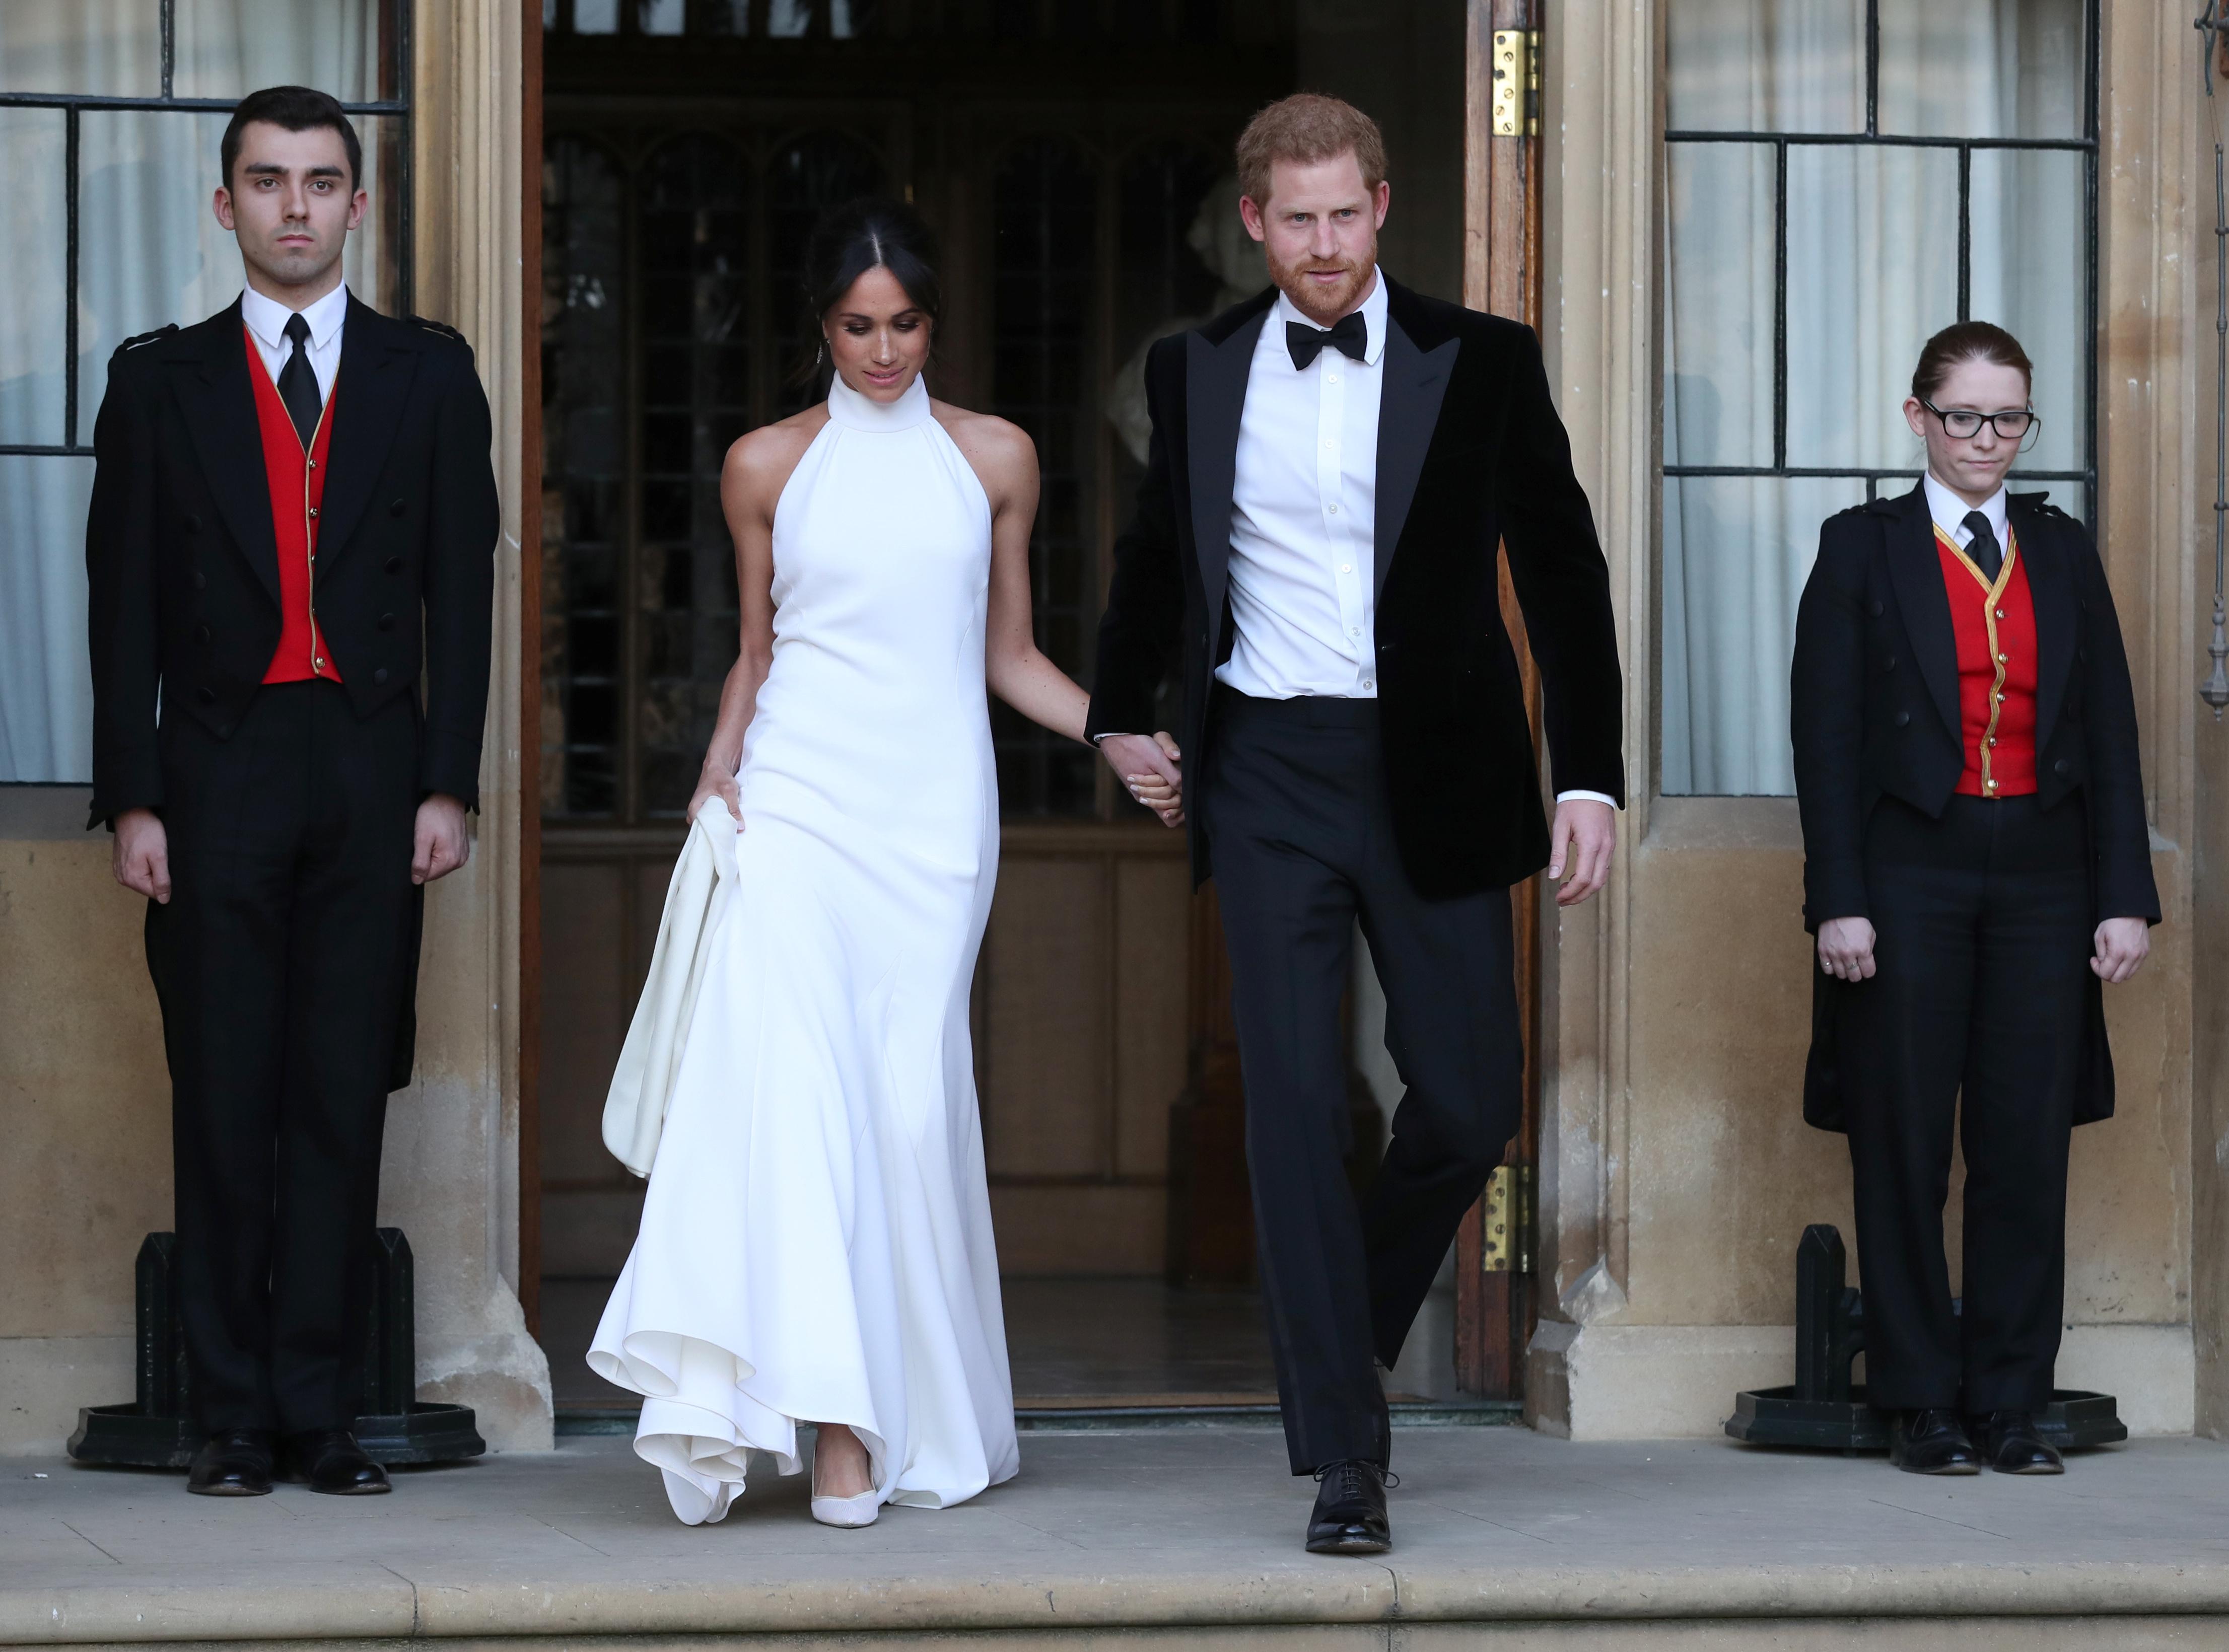 Meghan Markle: Η εμφάνιση με το δεύτερο εντυπωσιακό φόρεμα στο δείπνο του γάμου!